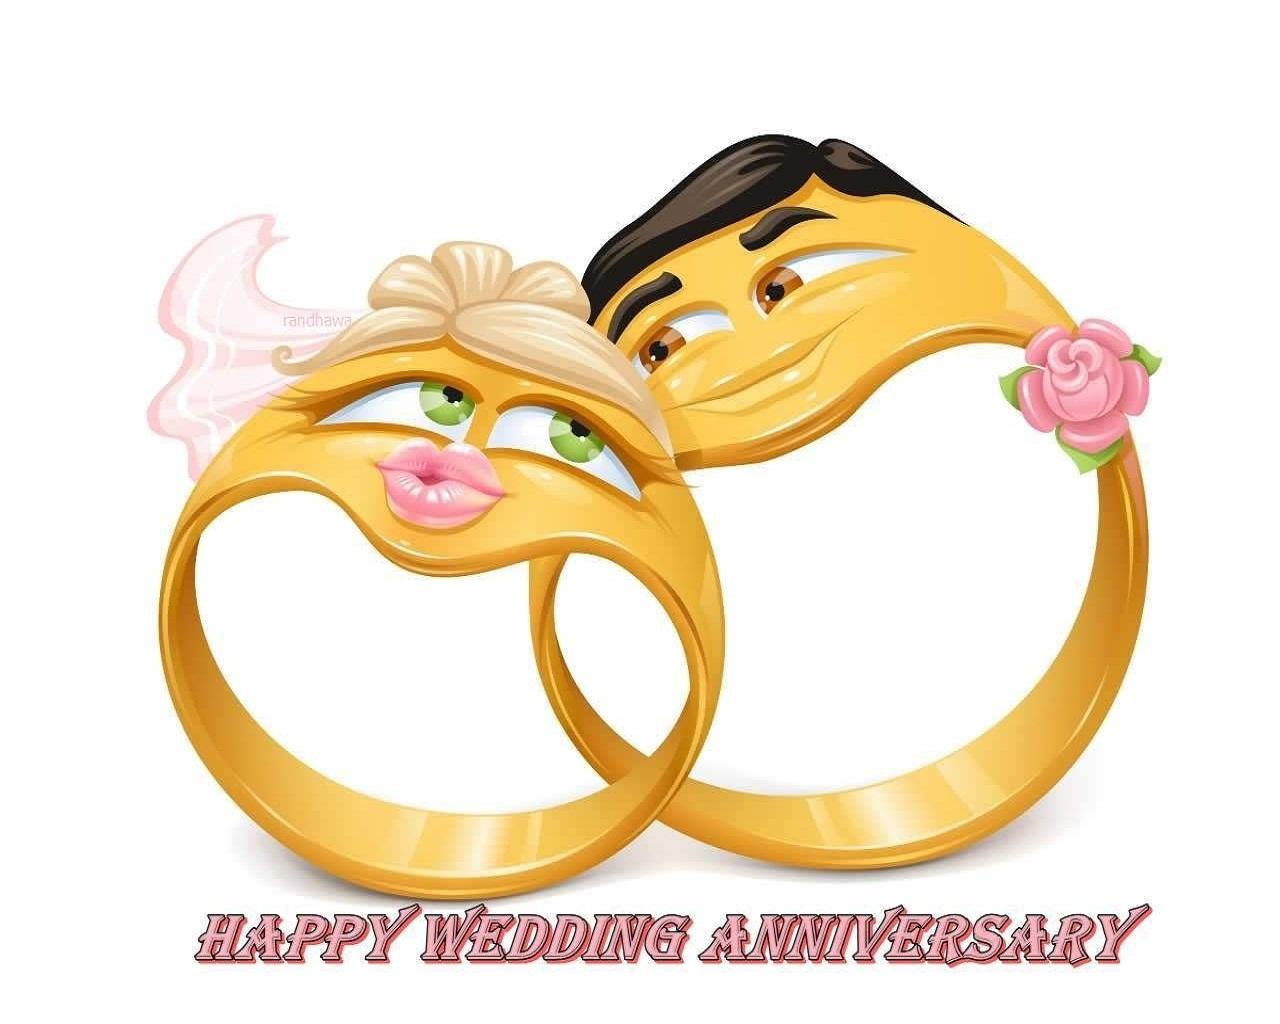 wedding-anniversary-quotes-happy-quotesgram-HSirlZ-quote